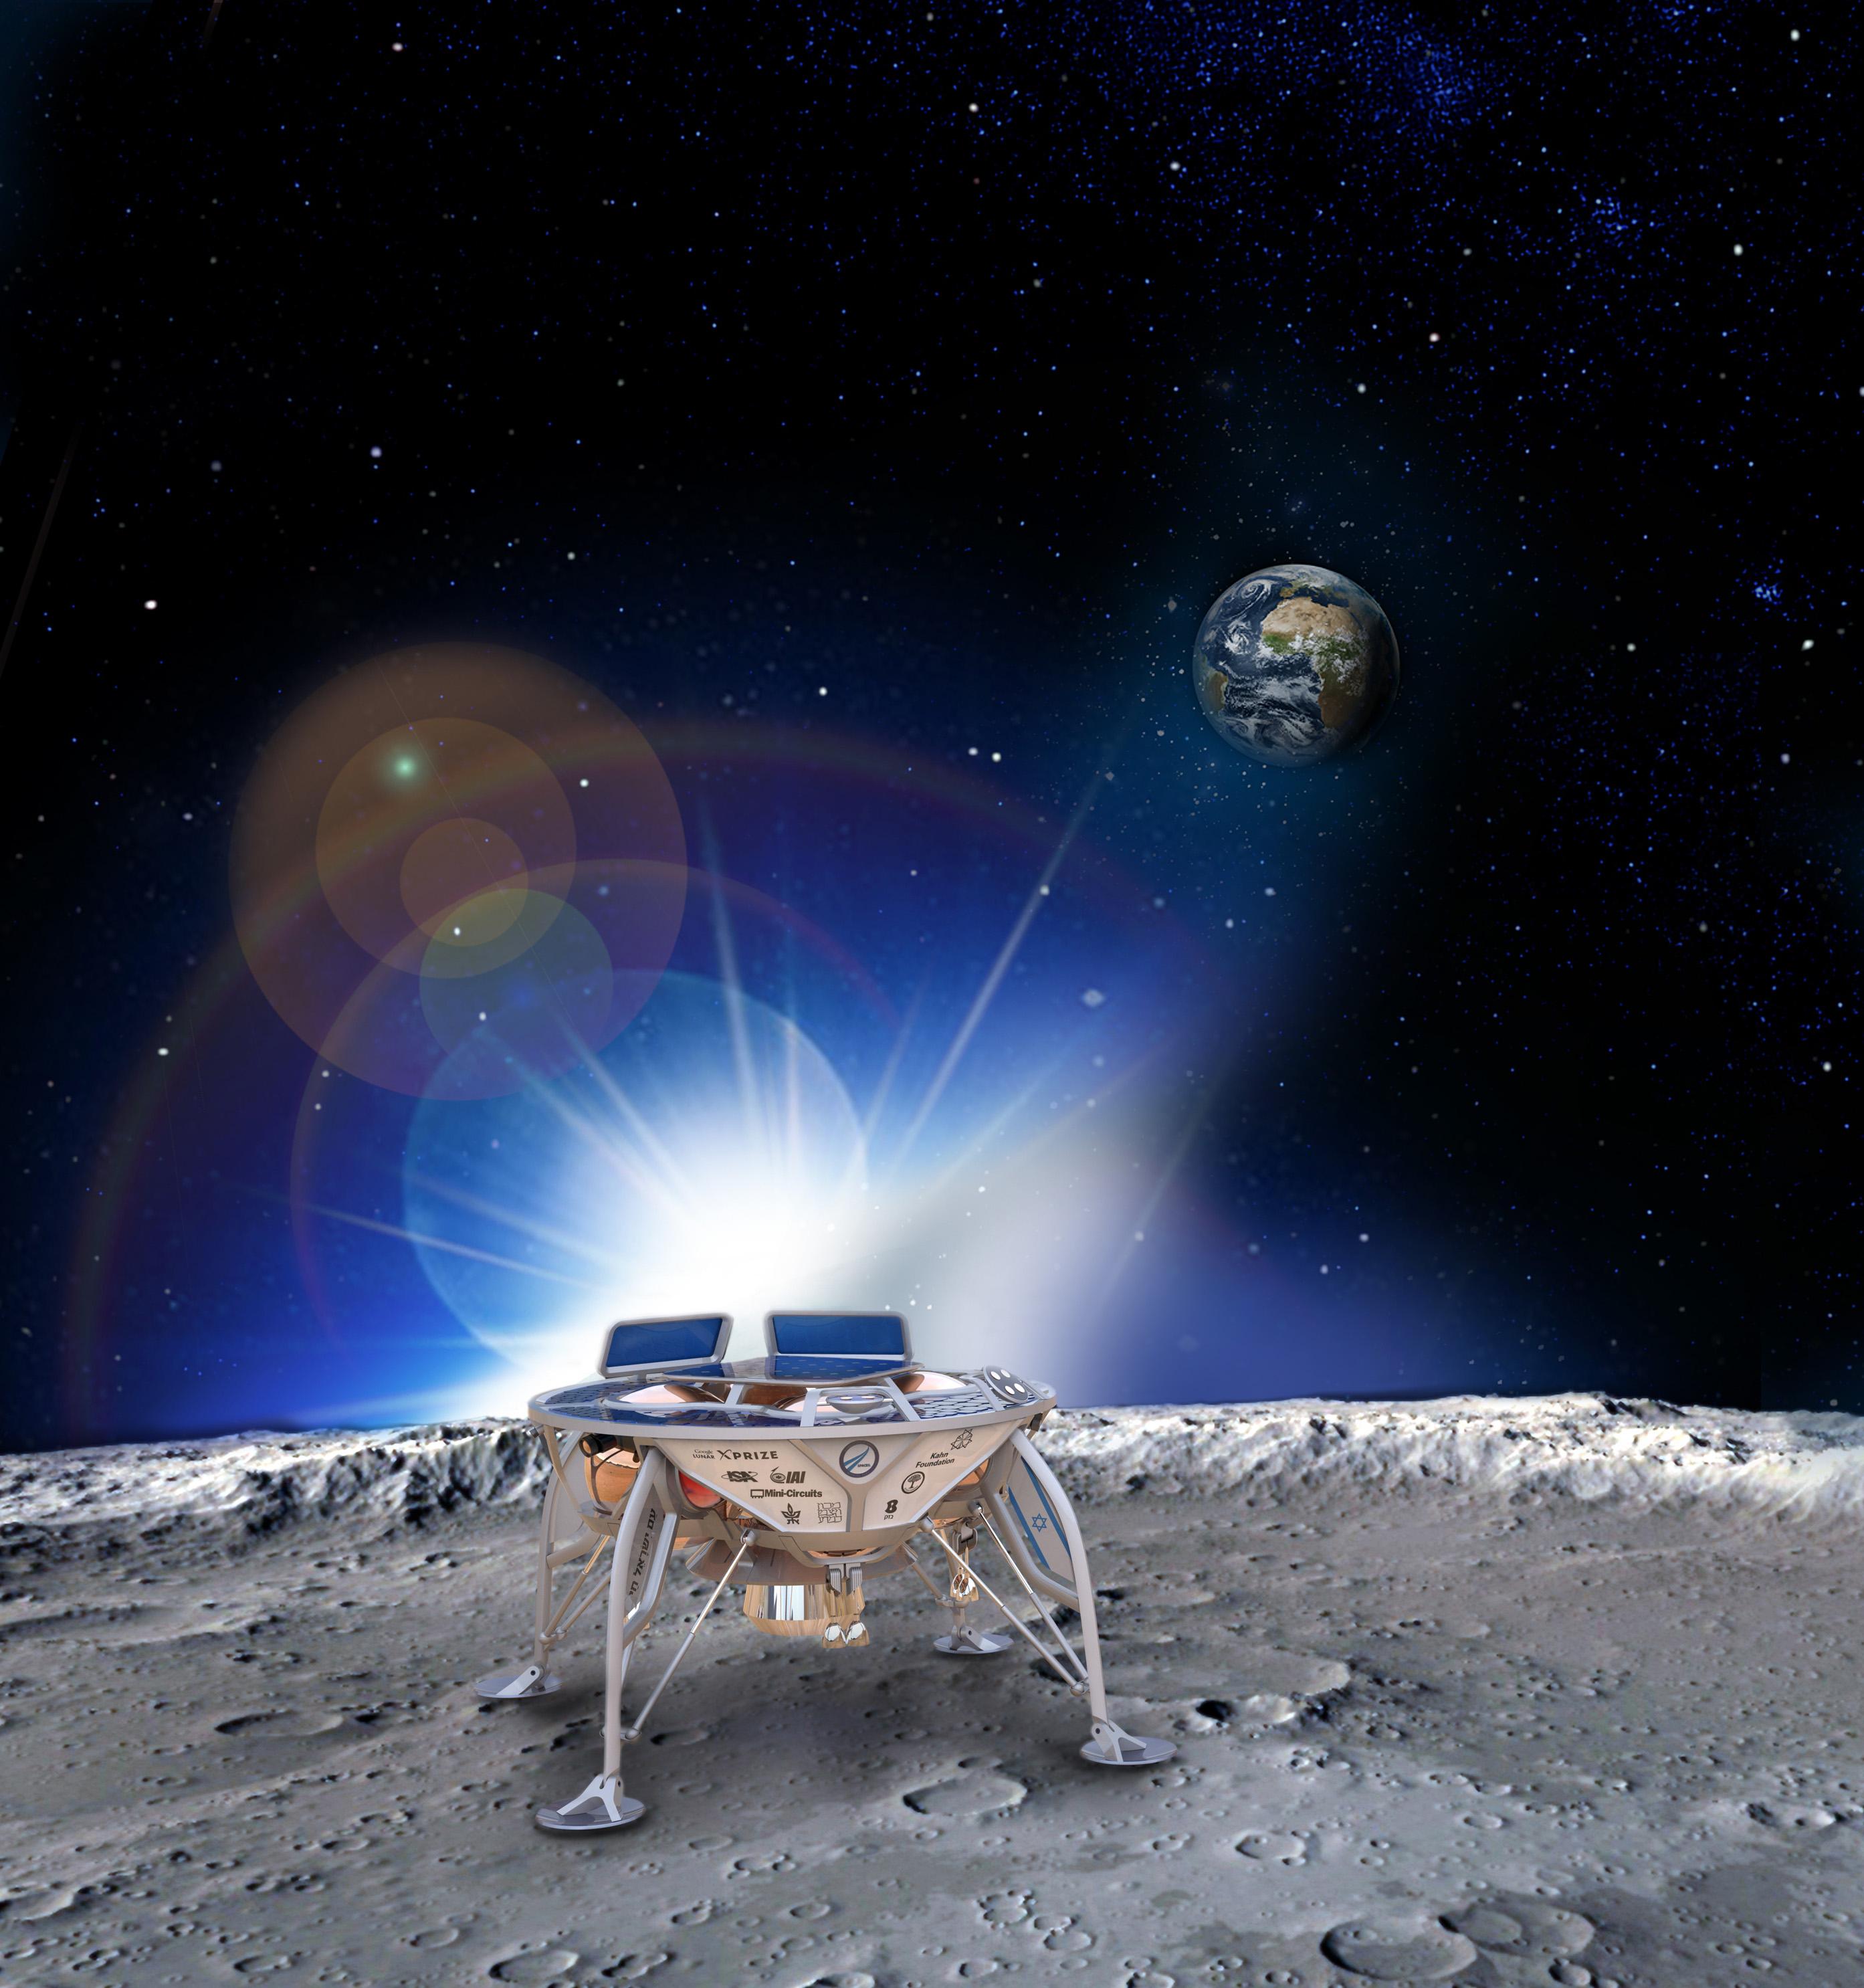 Courtesy of SpaceIL, Google Lunar XPRIZE